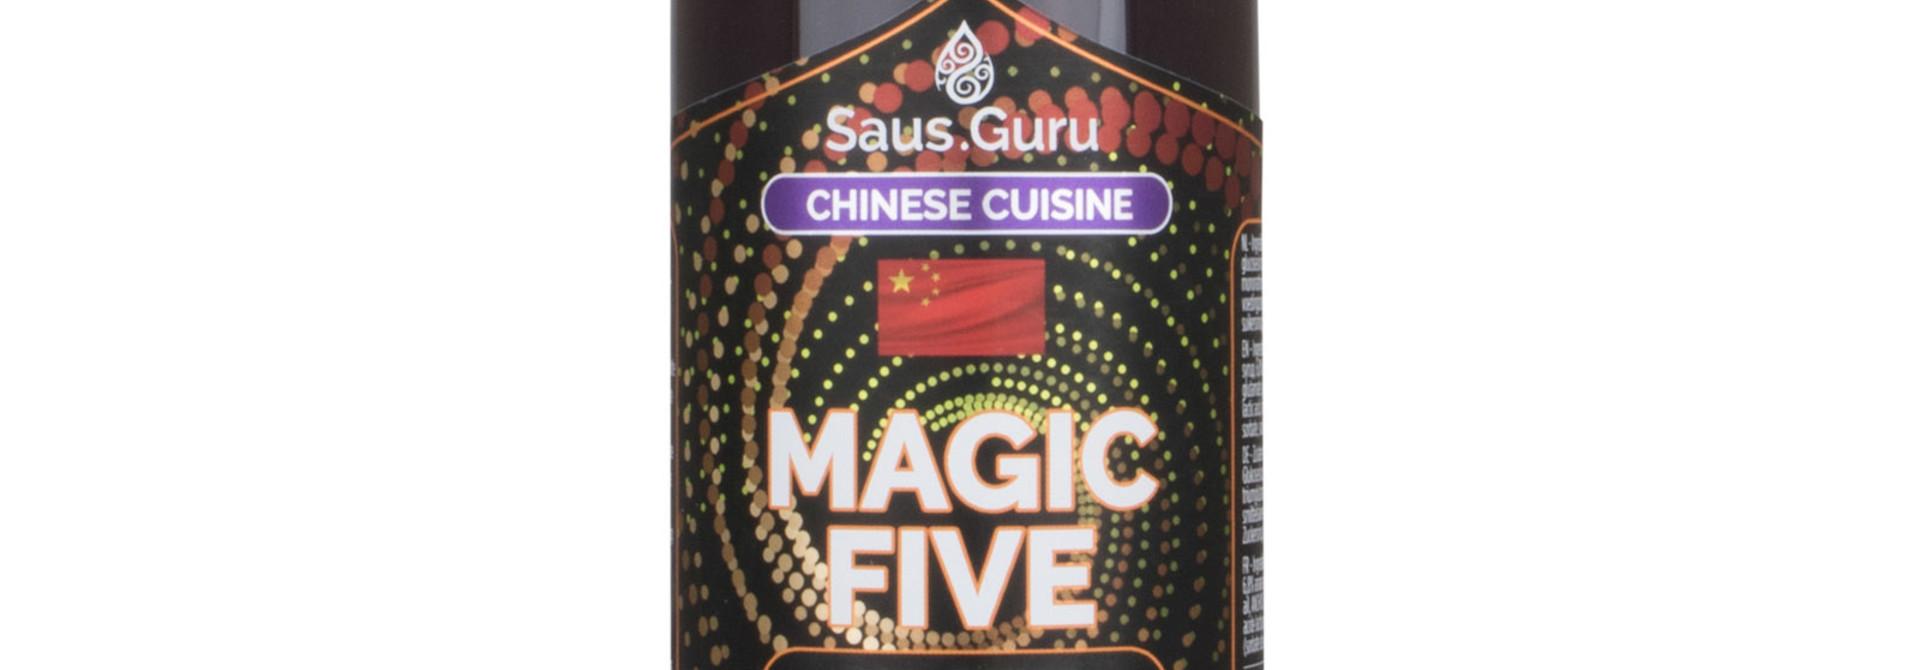 Saus.Guru's Magic Five